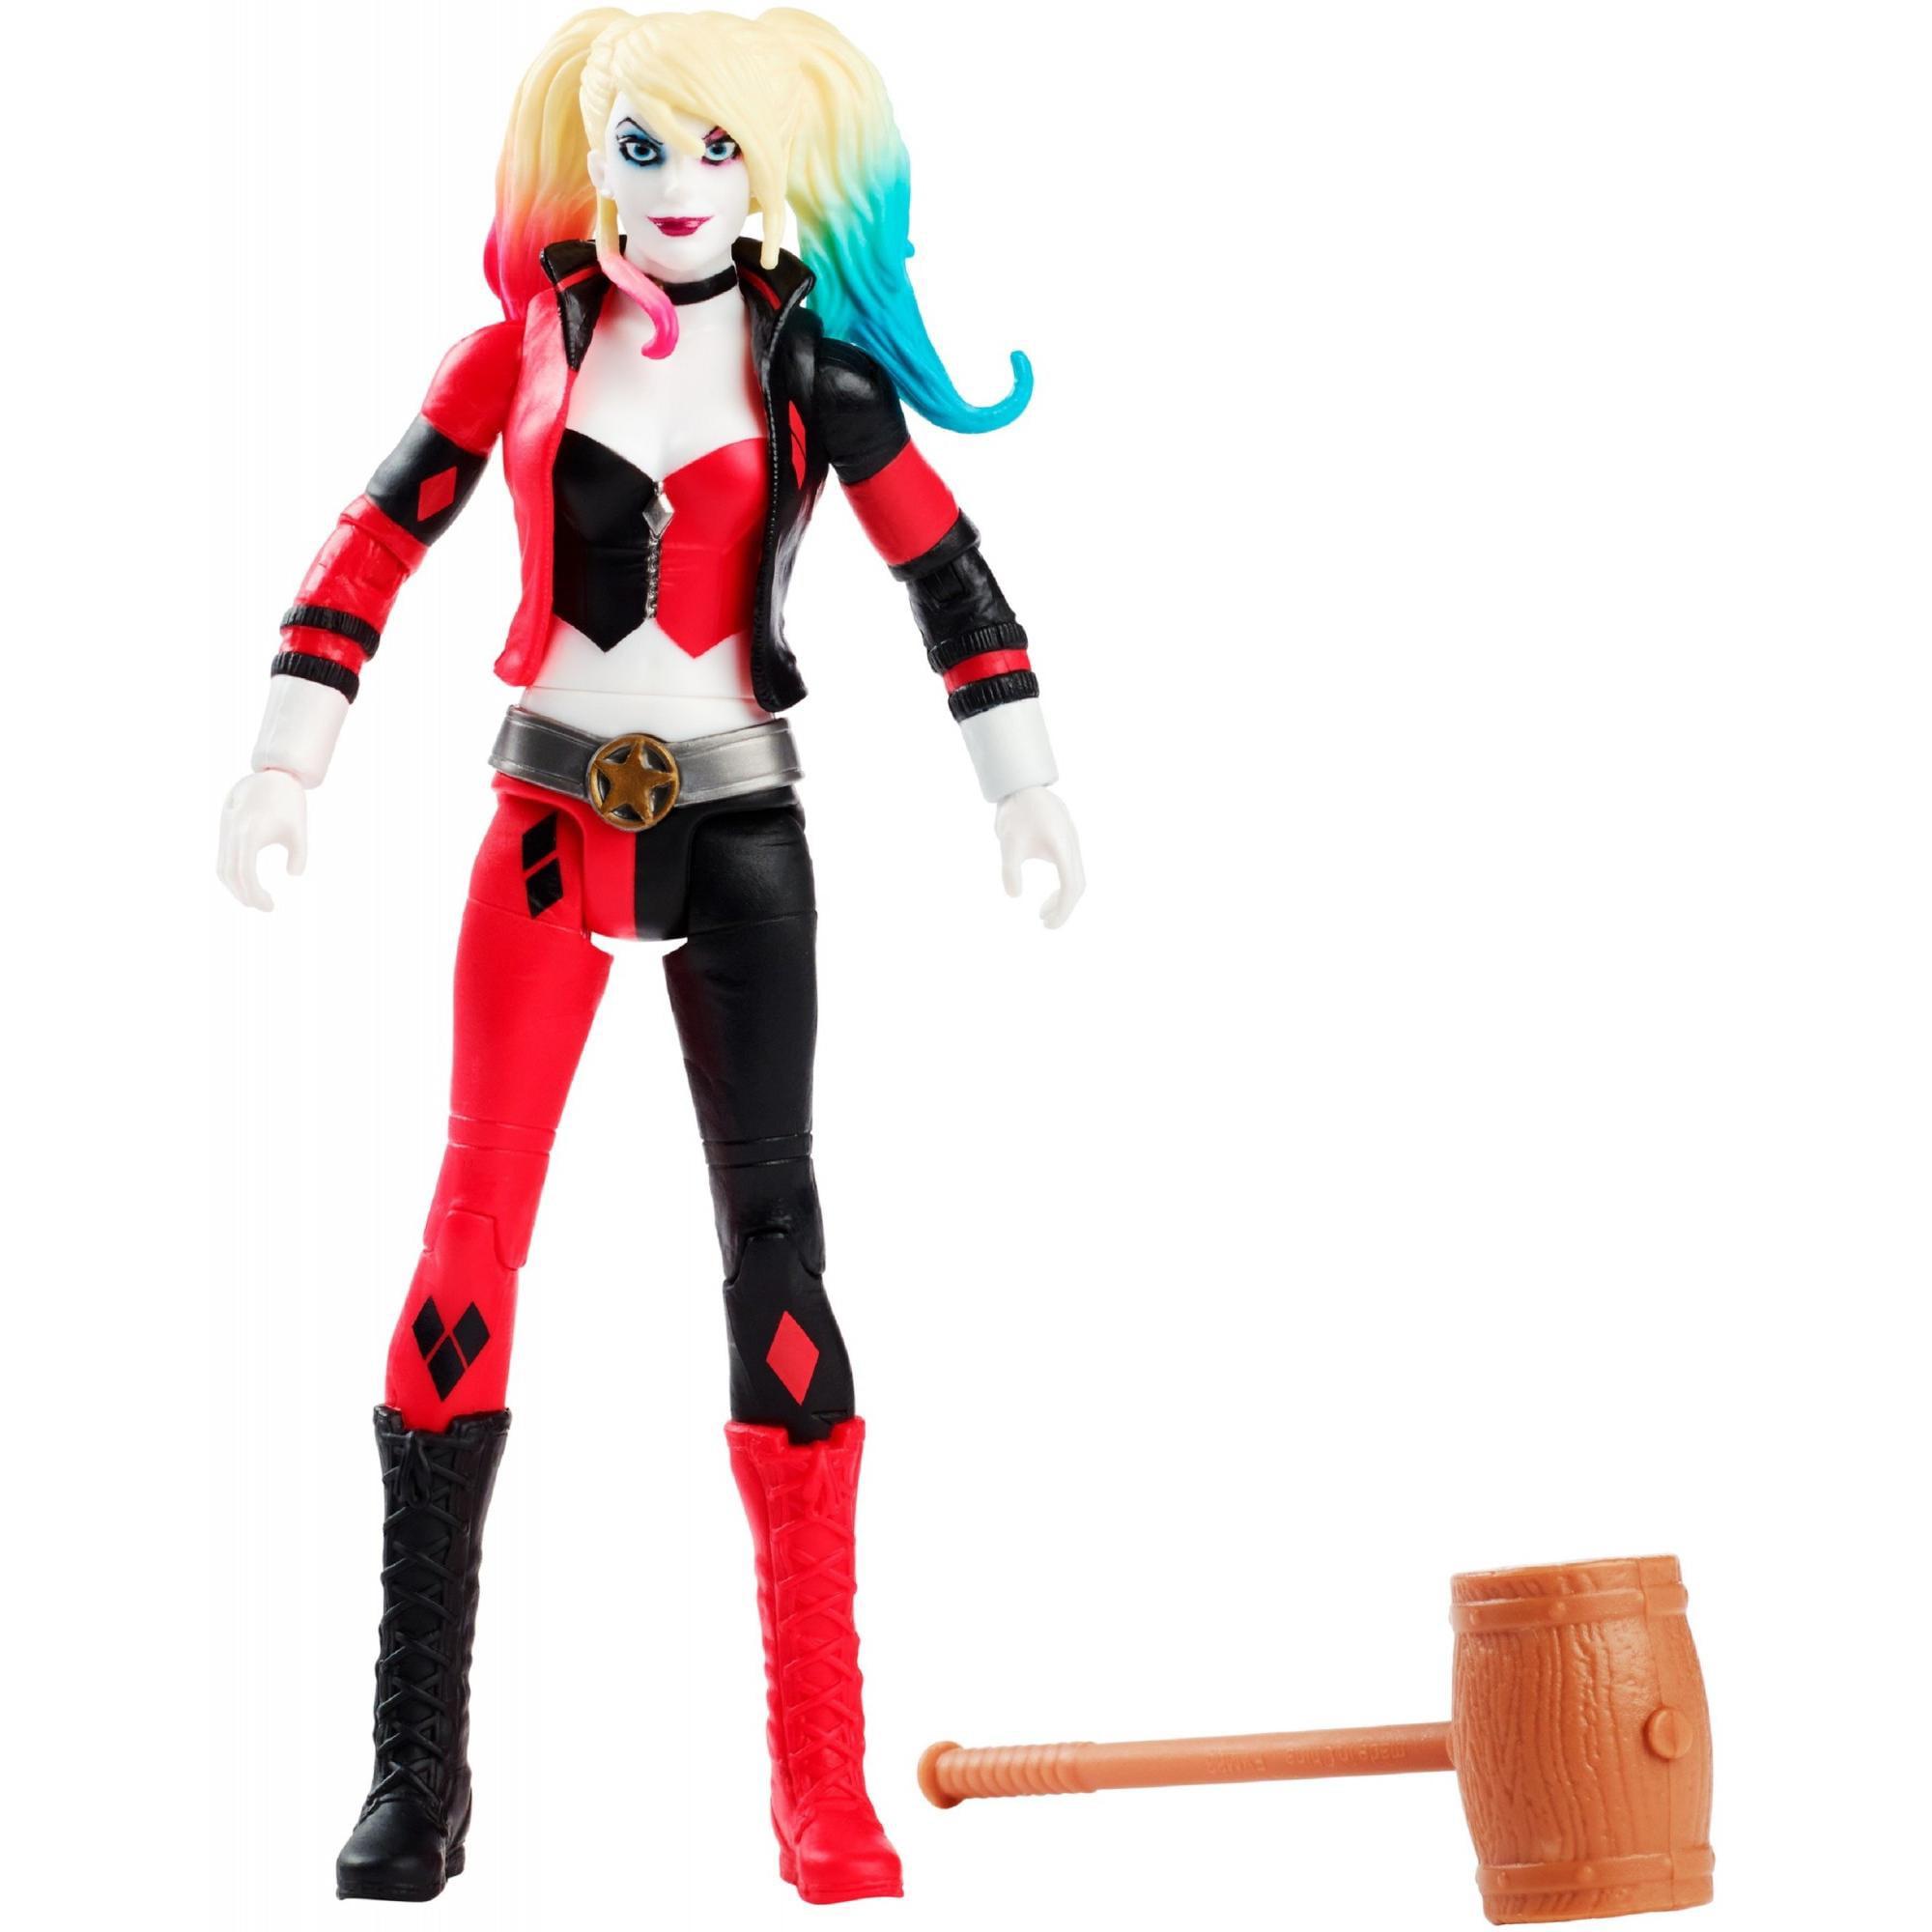 Batman Missions Harley Quinn Figure by Mattel